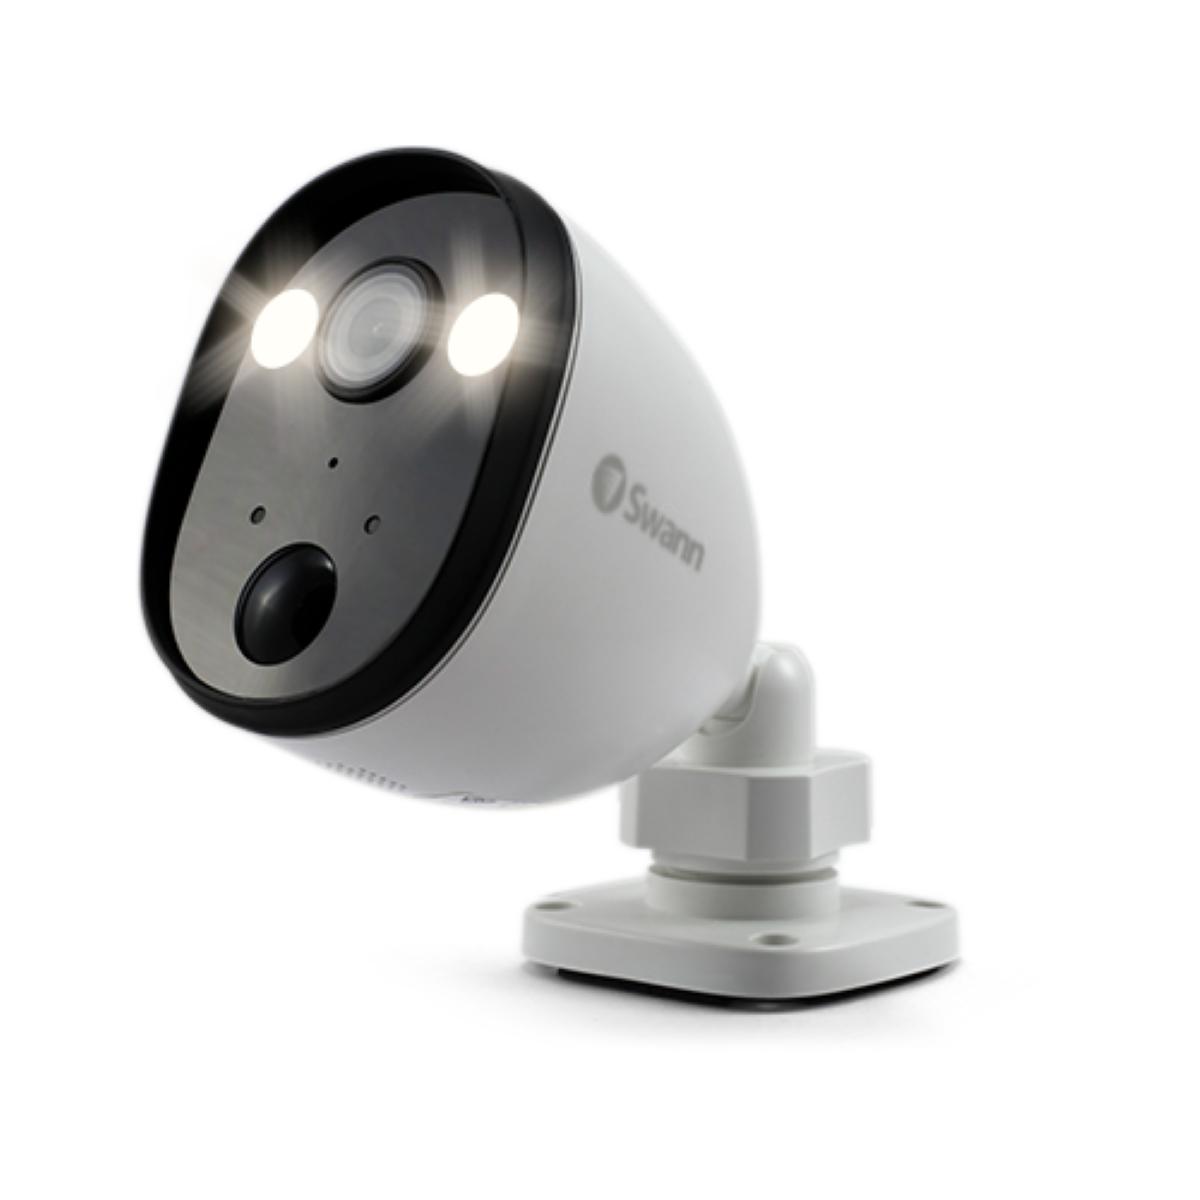 Swann Spotlight Security Camera - Design